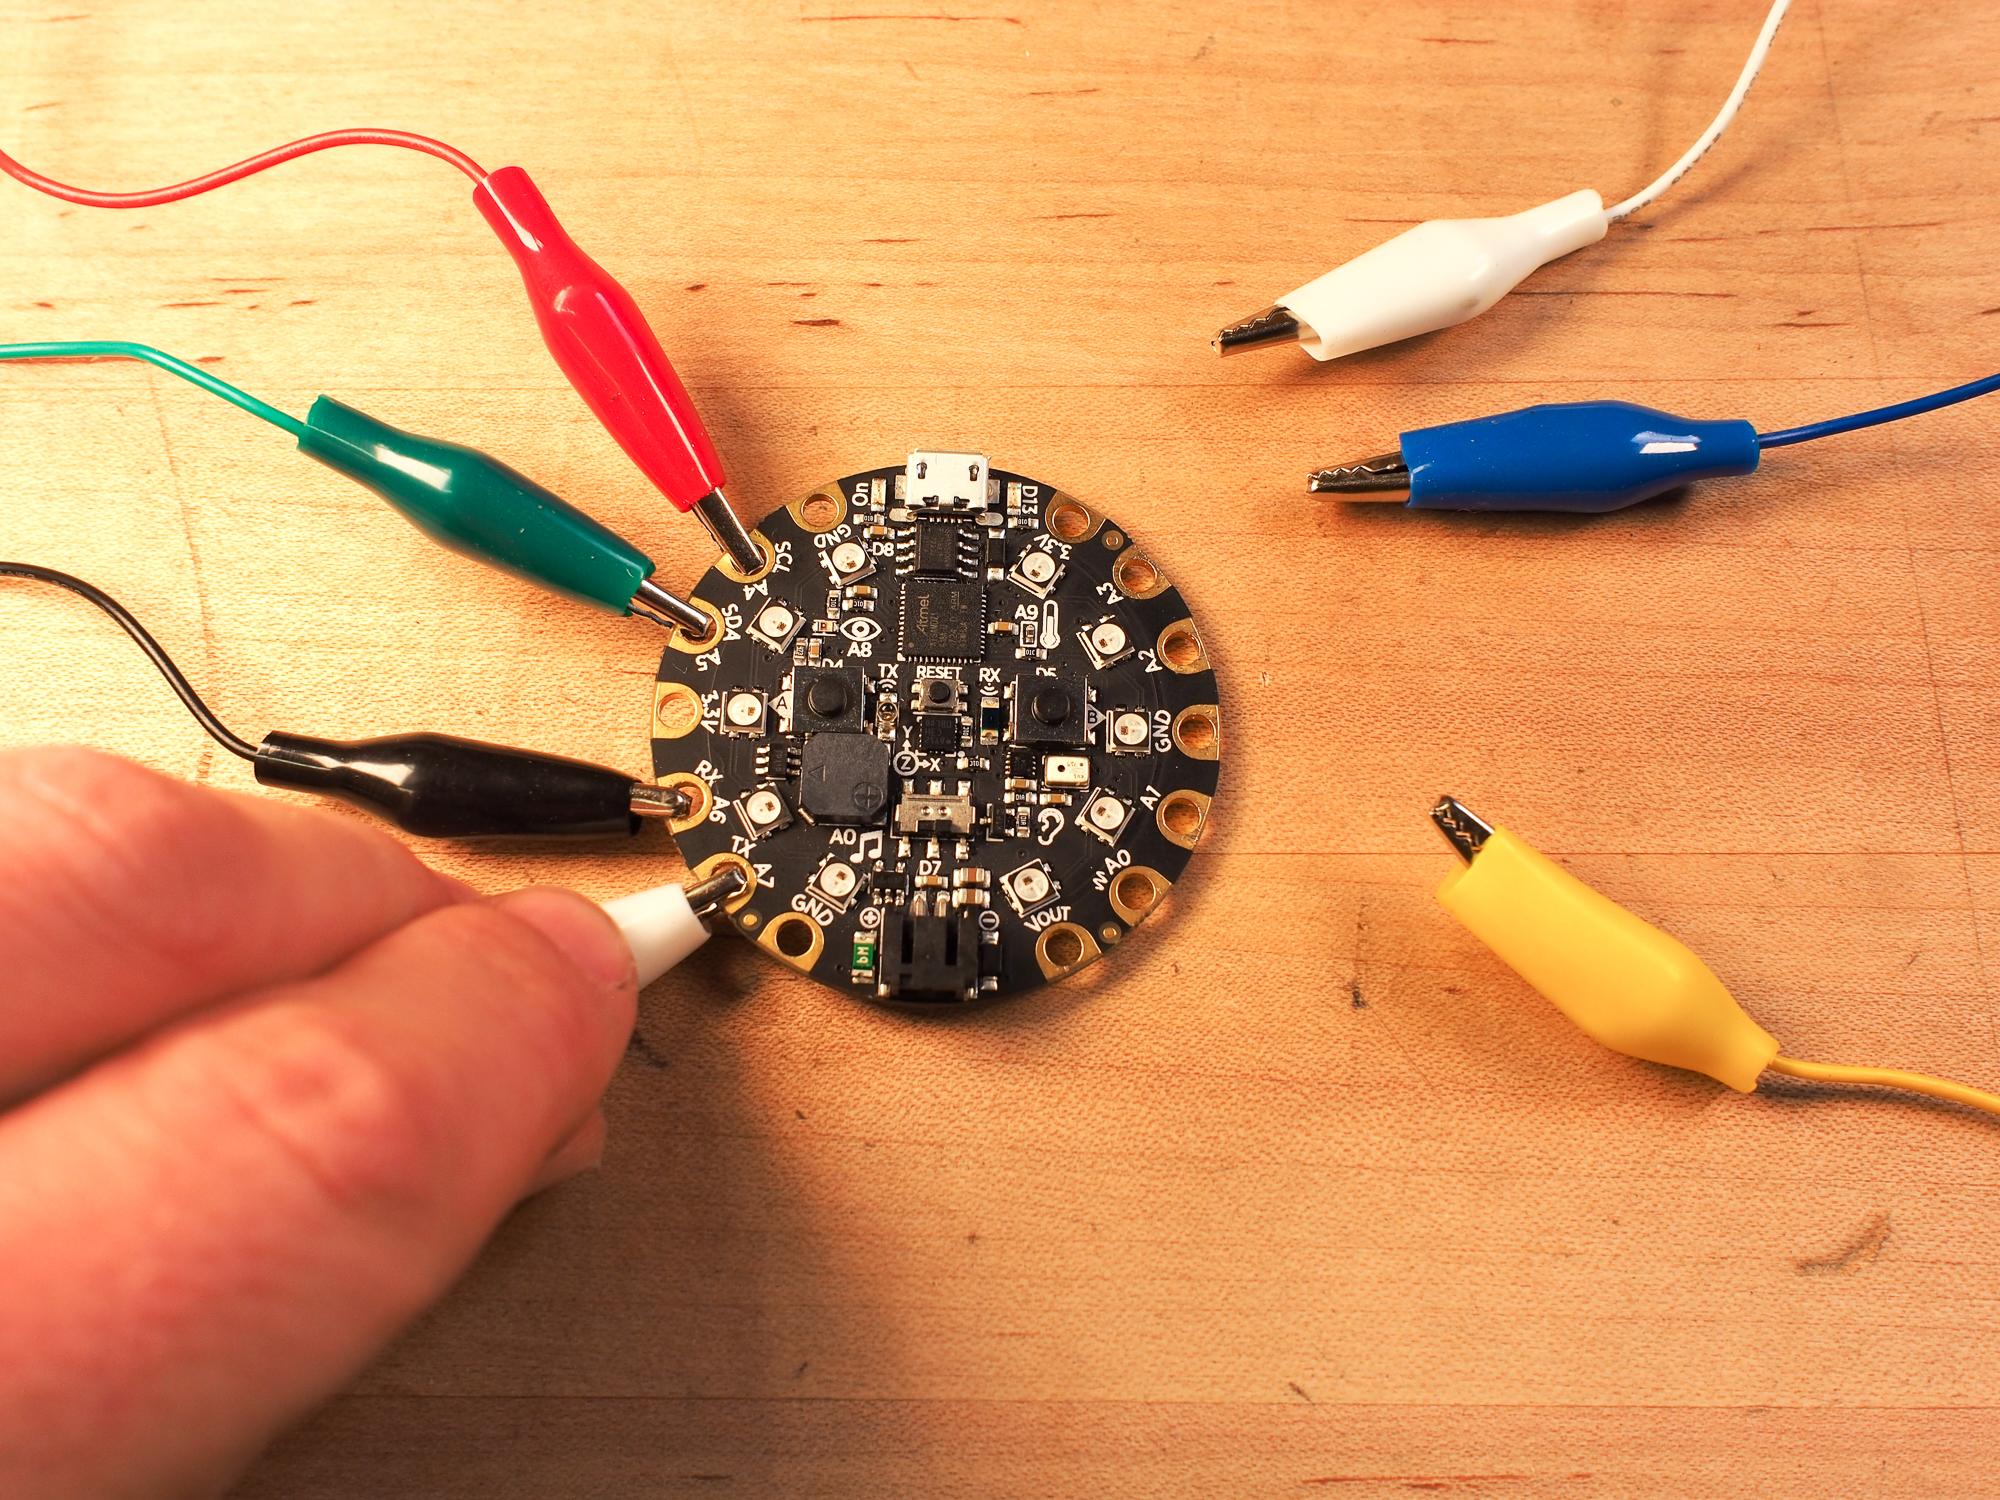 circuitpython_PC090586_2k.jpg